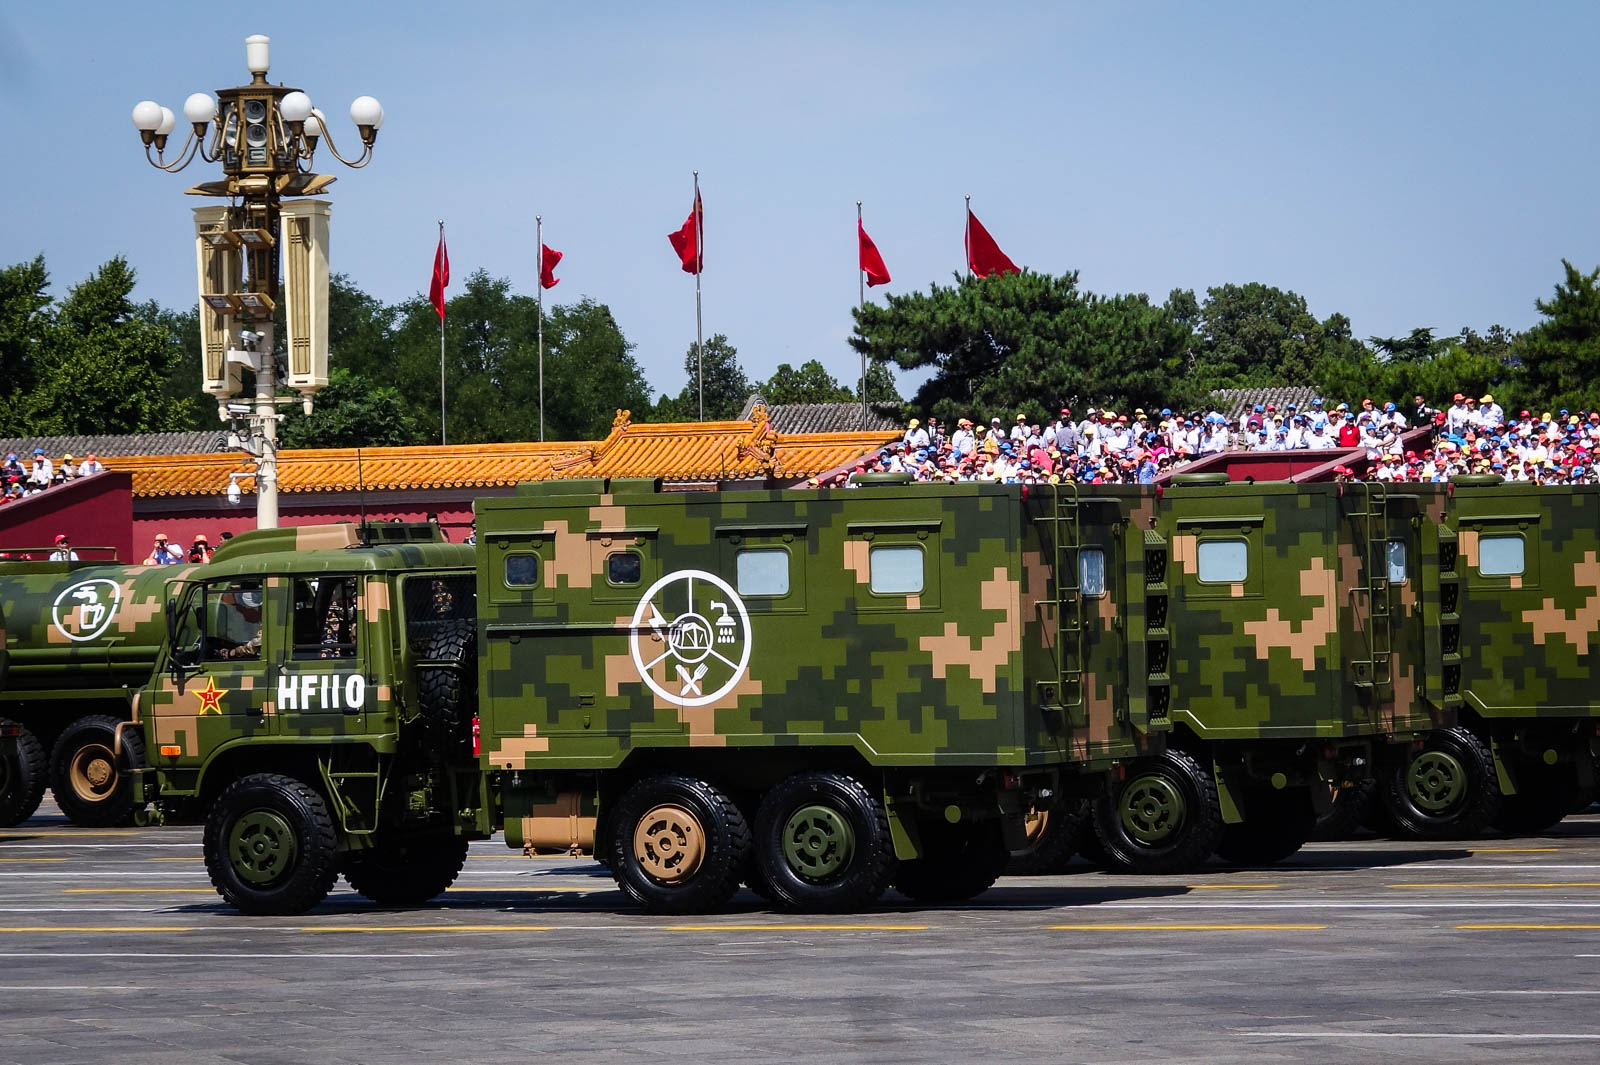 beijing-china-military-parade-2015-38